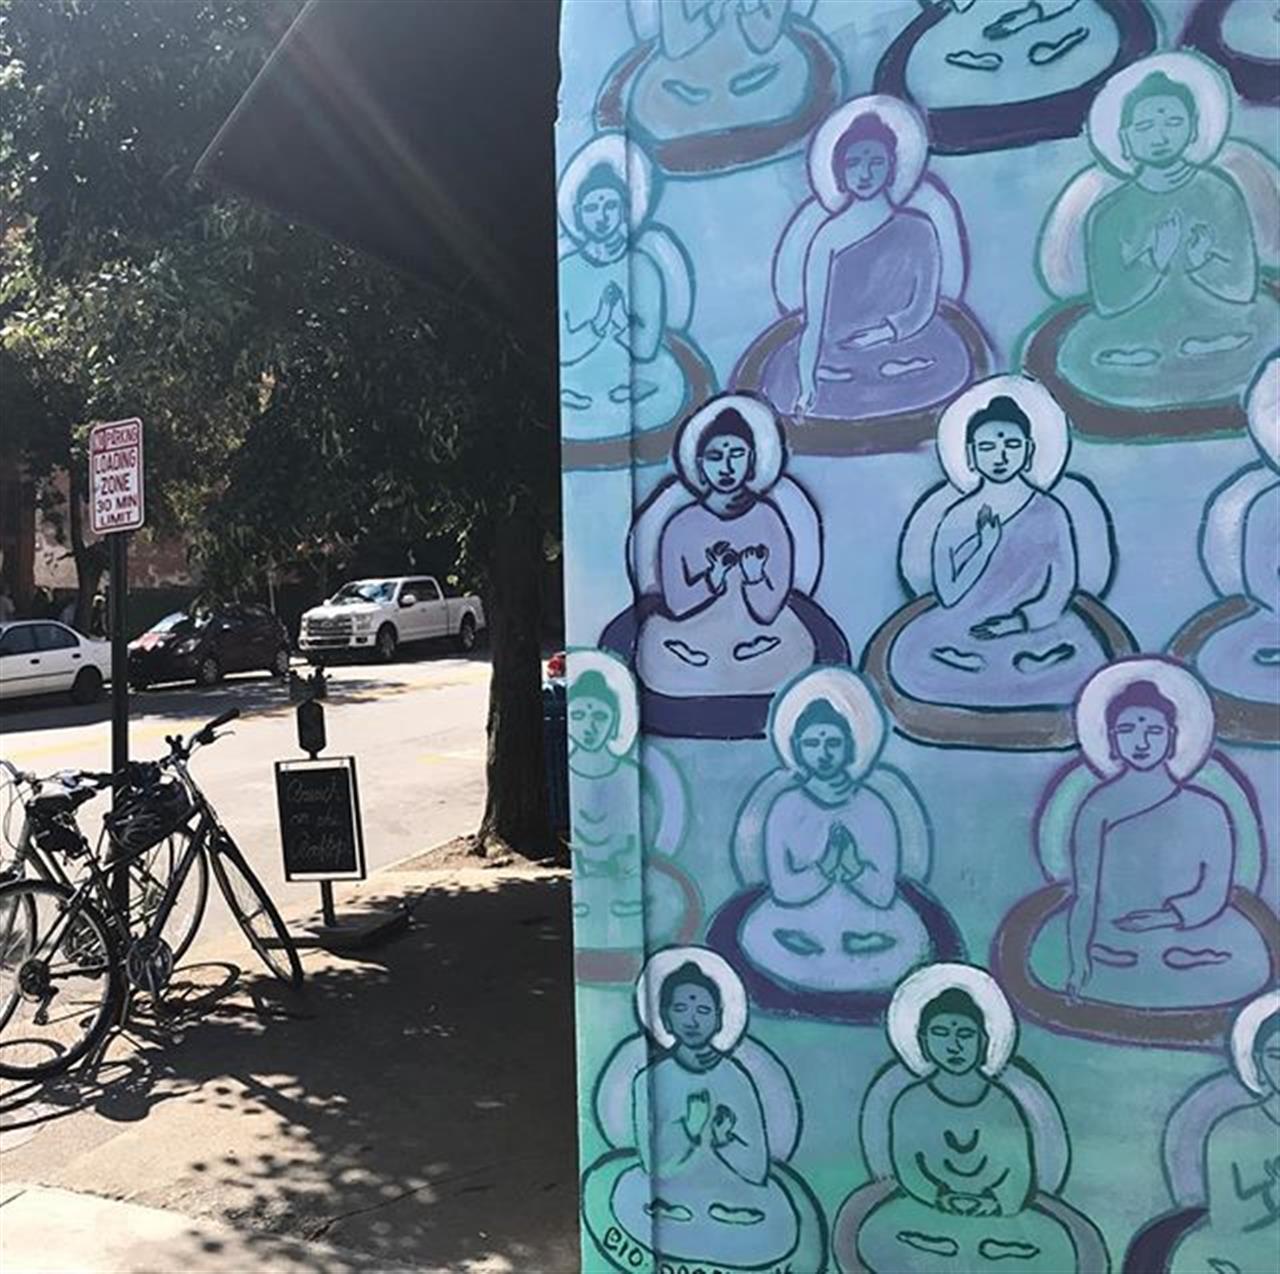 #asheville #muralsofasheville #ashevilleyogafestival #bh #leadingrelocal #namaste